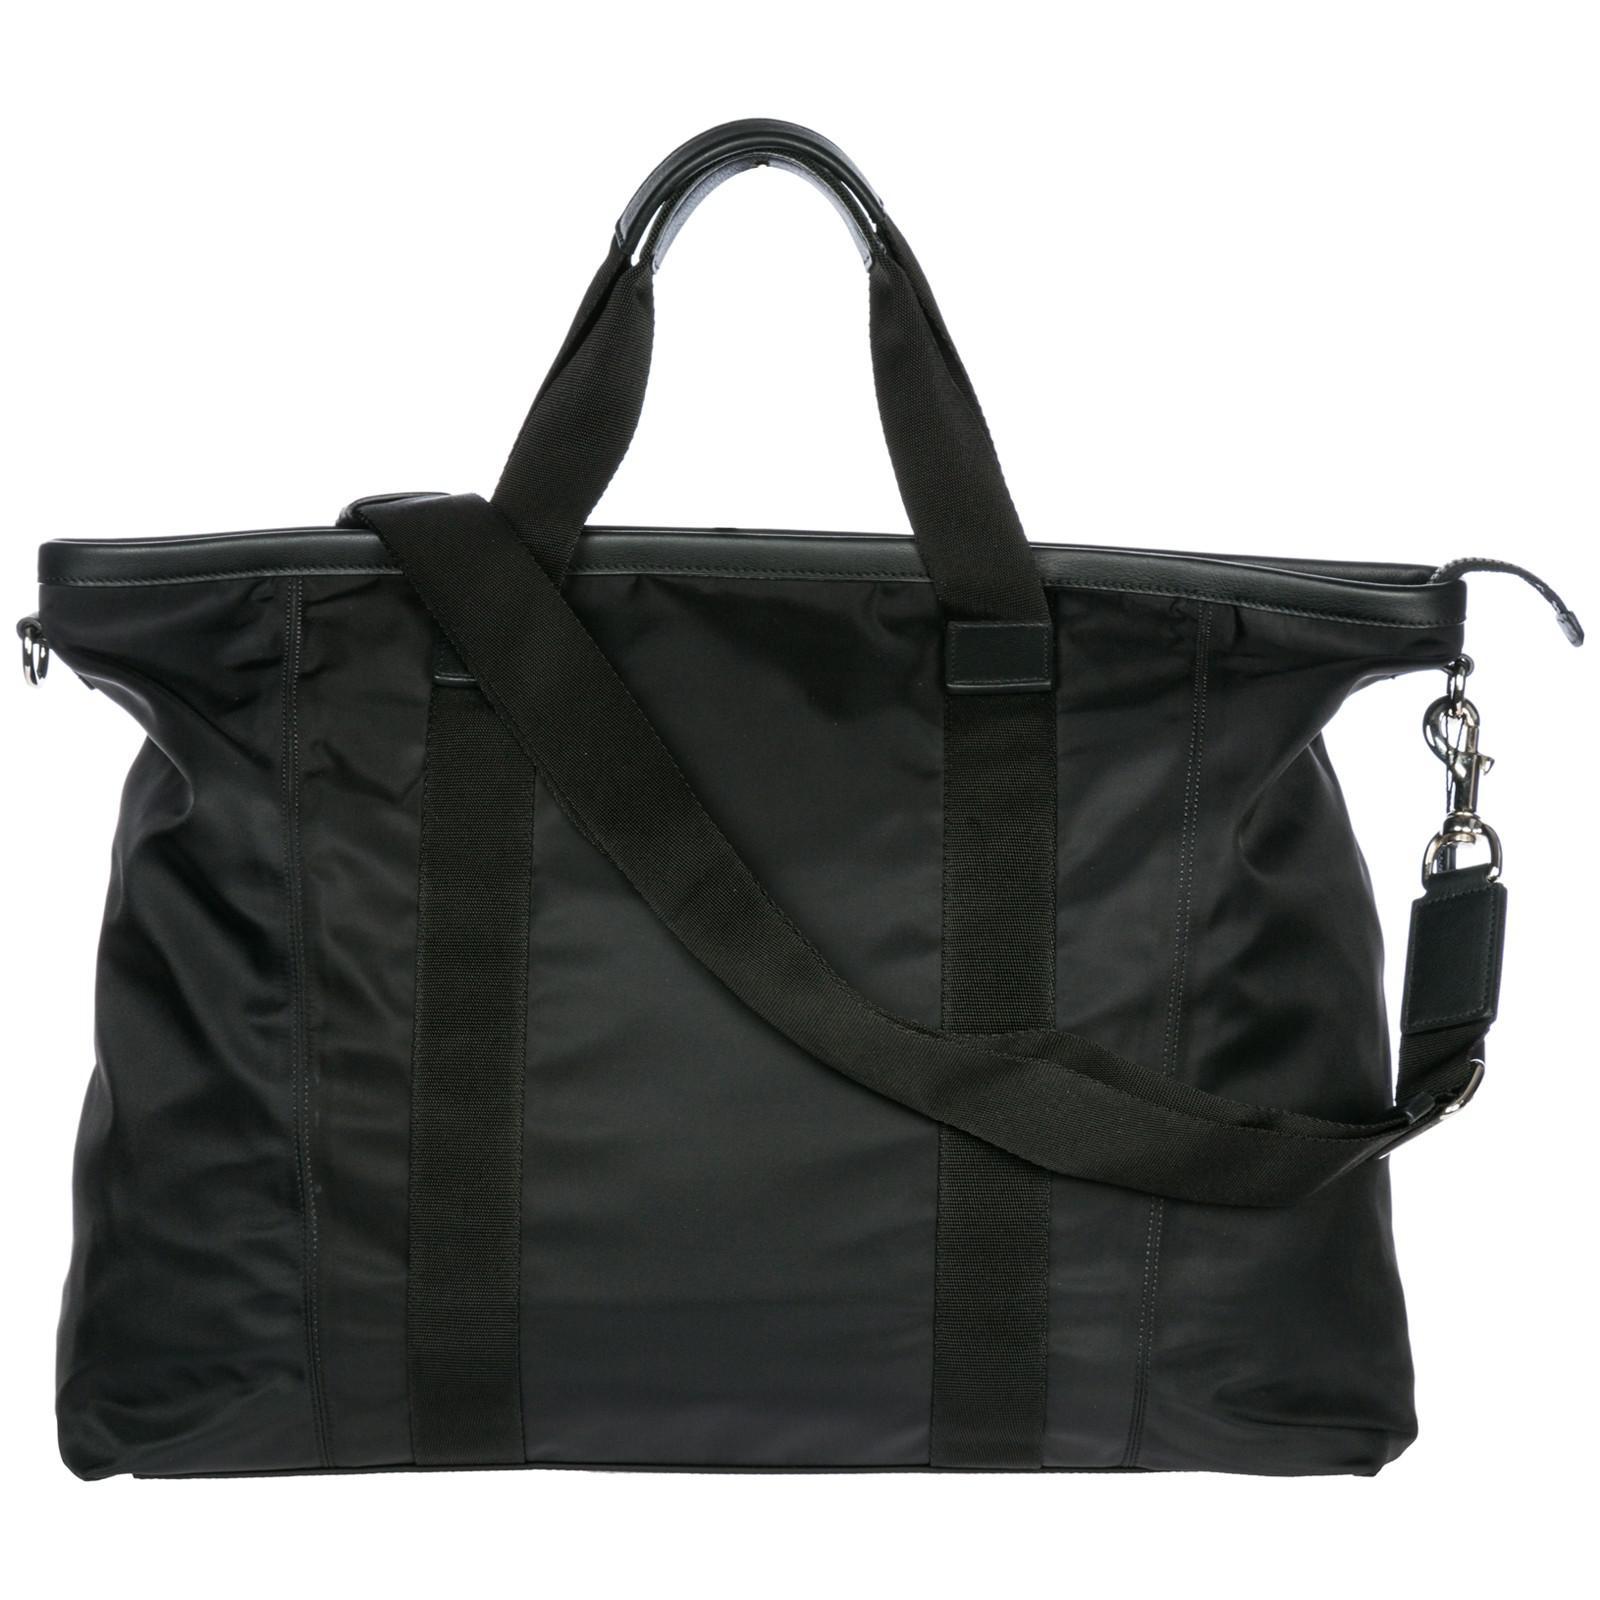 Dolce   Gabbana - Black Bag Handbag Shopping Tote - Lyst. View fullscreen d608ba9c58c29